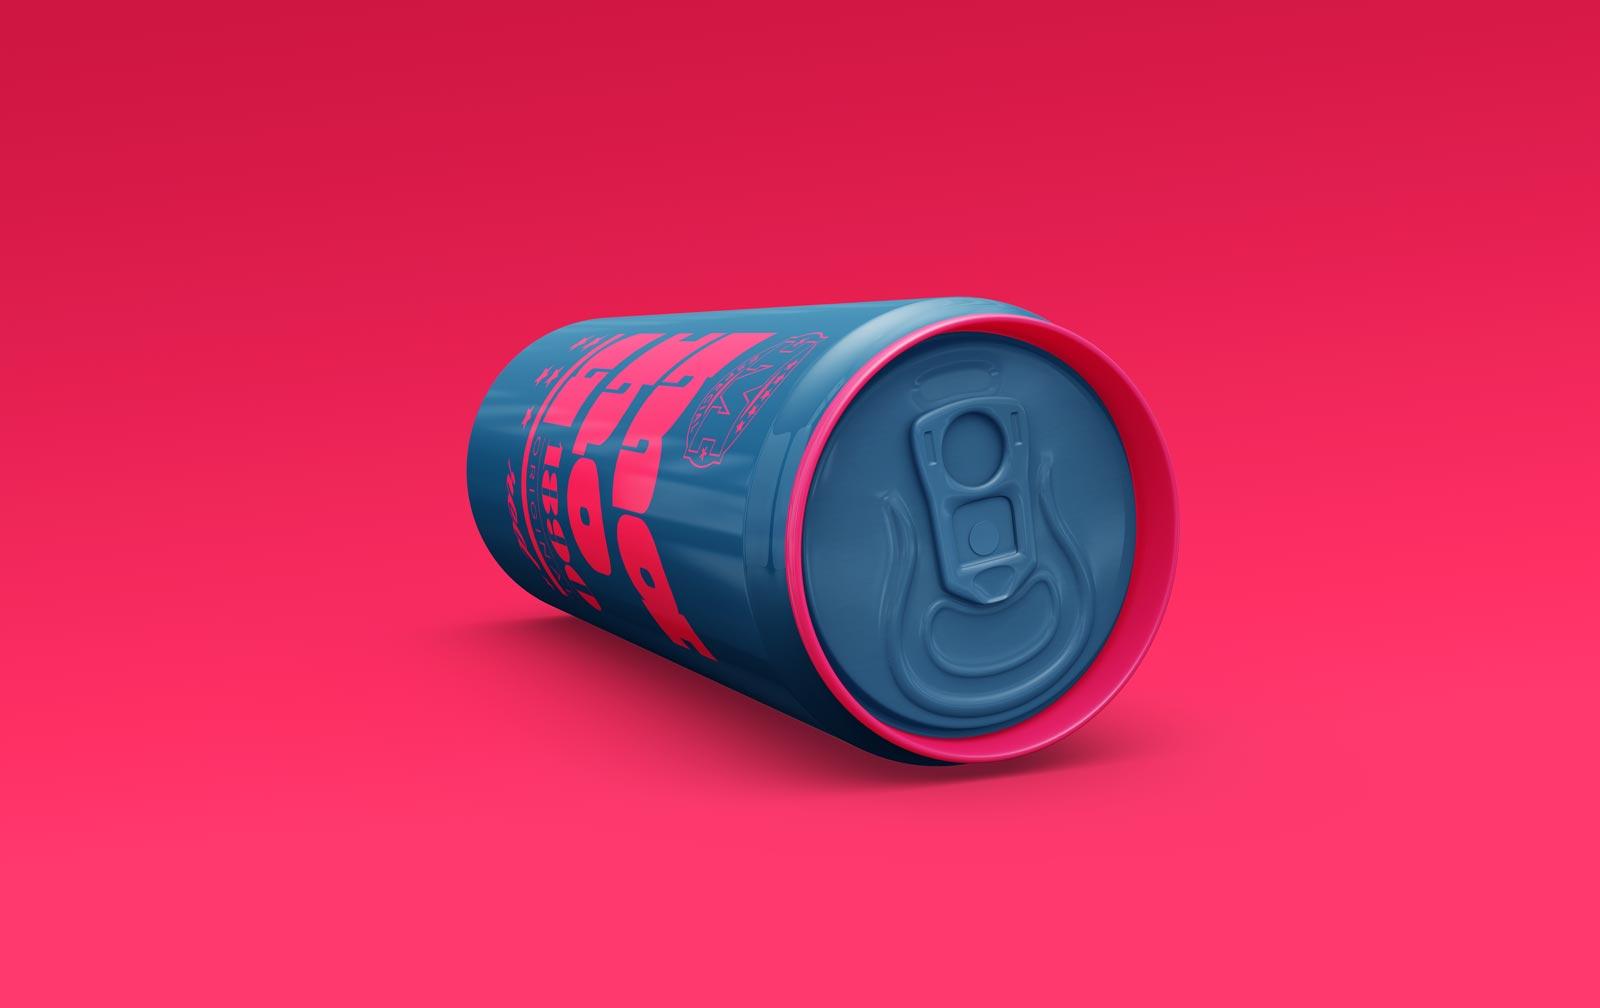 Mahou-Packaging-10